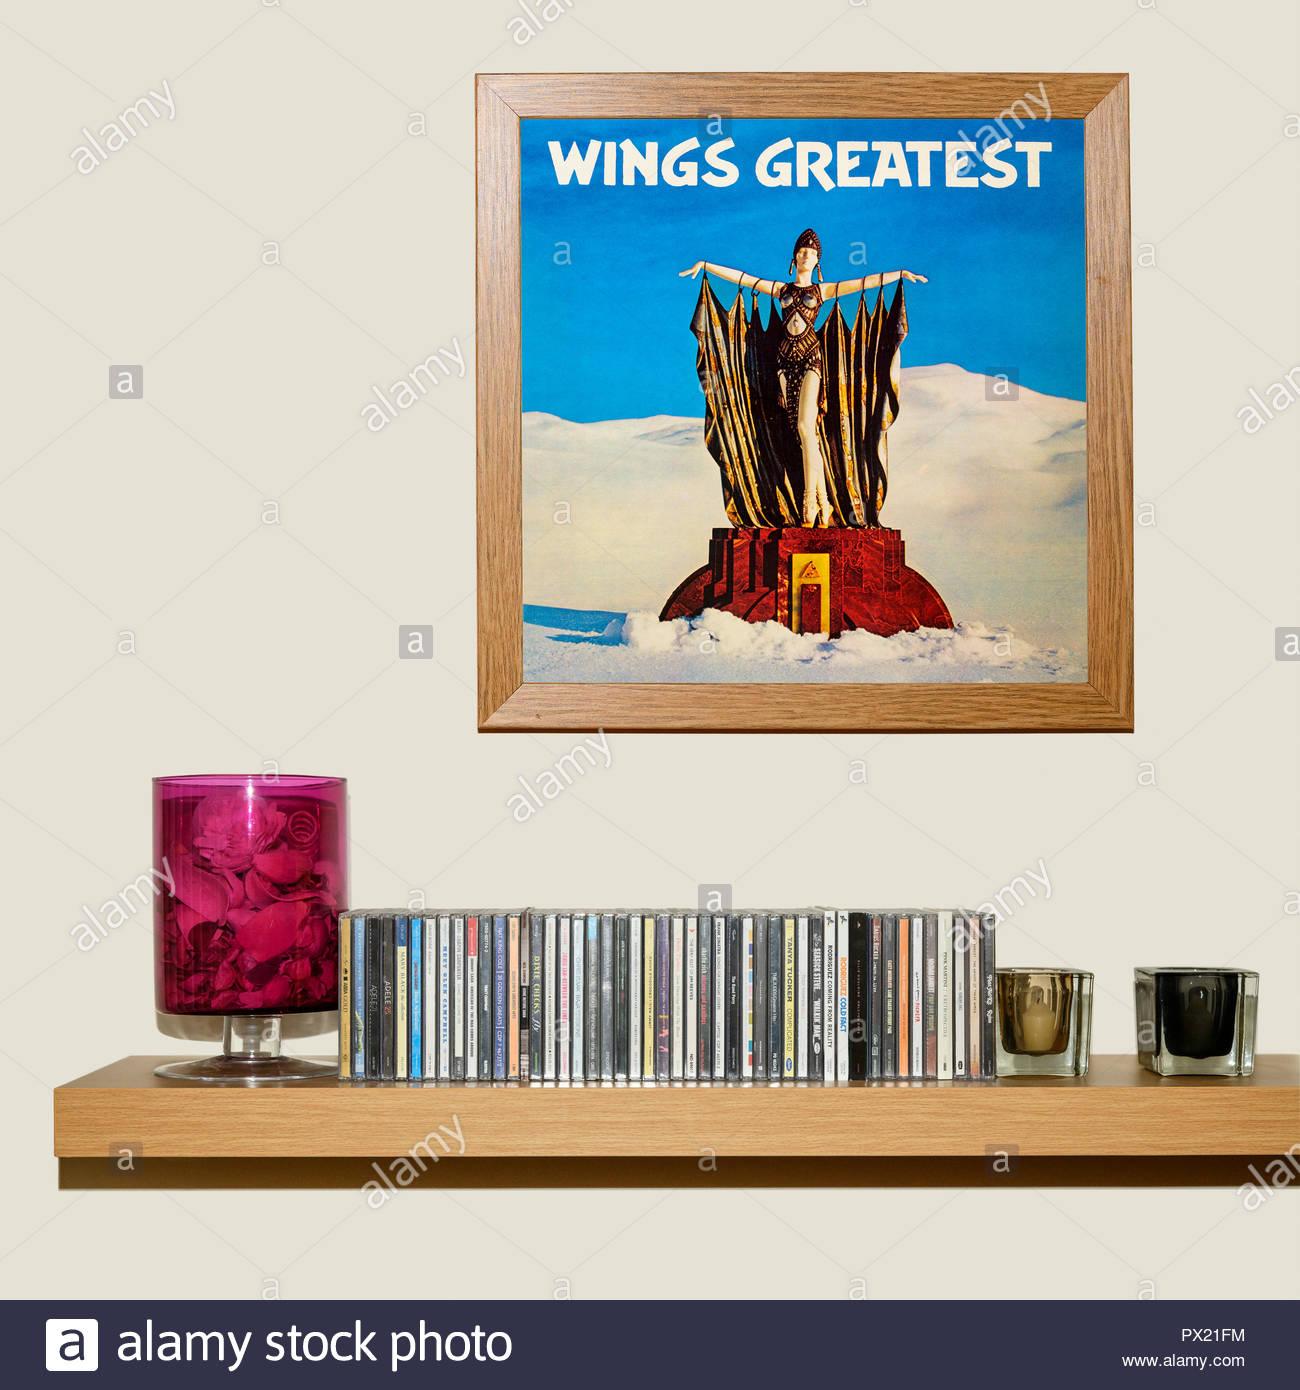 Paul Mccartney And Wings Stock Photos & Paul Mccartney And